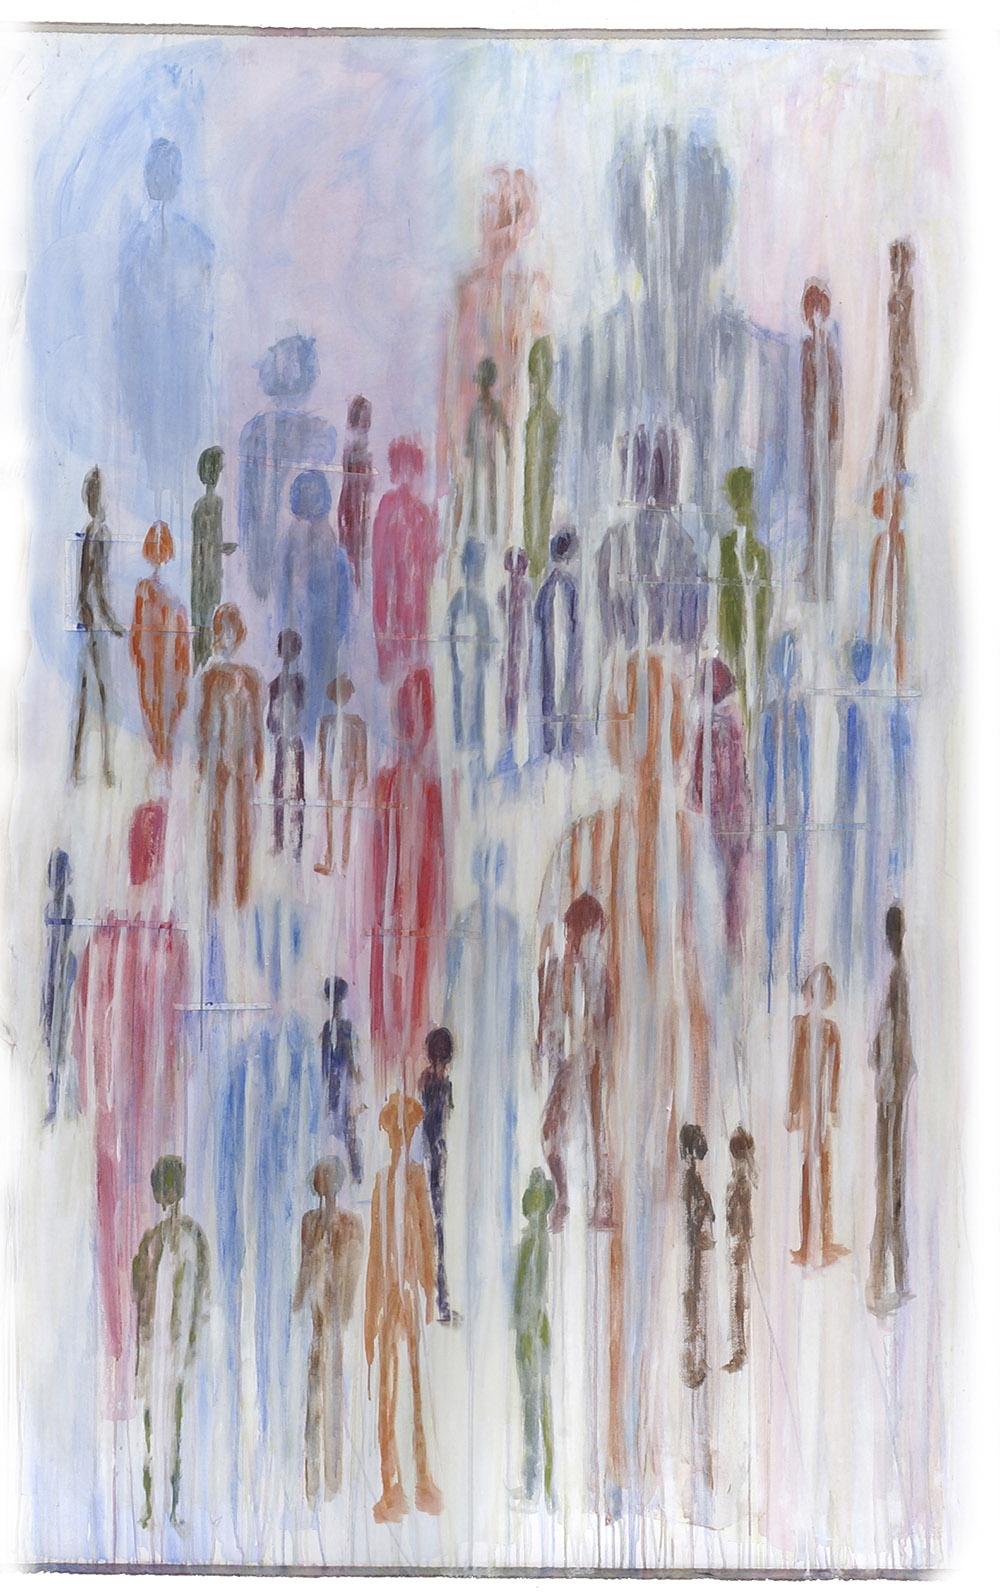 2.c-Ono-Crowds-2008.-Acrylic-on-canvas-approx.-200-x-100-cm-x.jpg